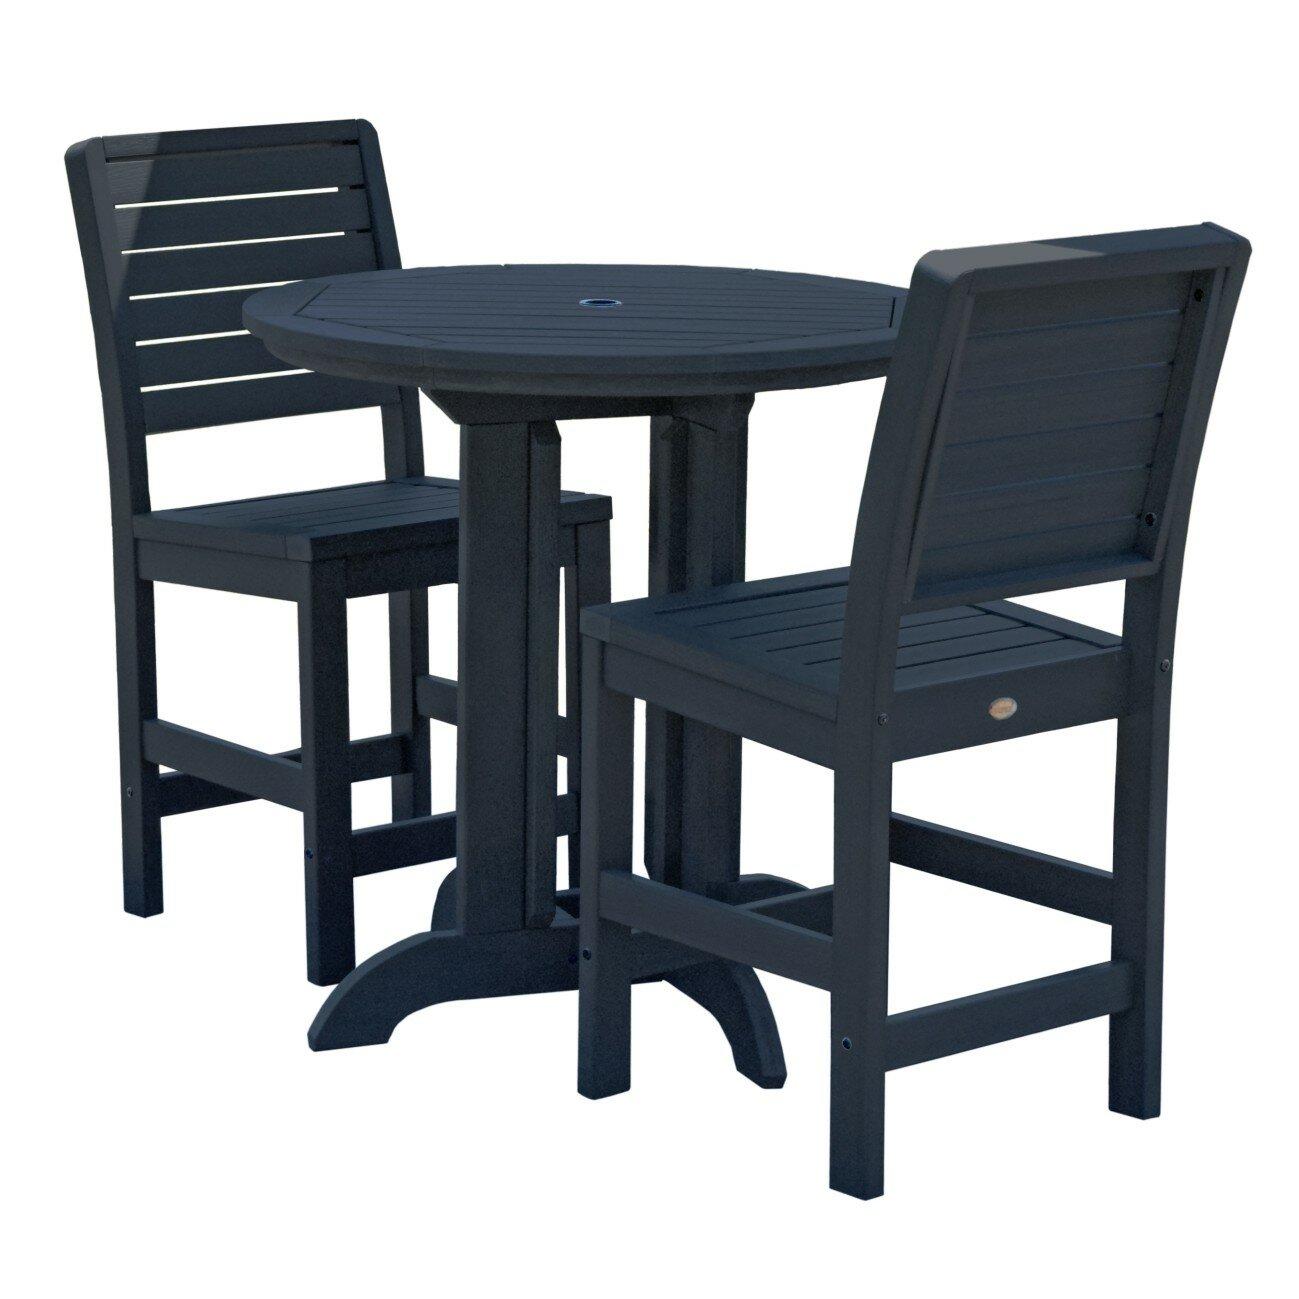 Longshore Tides Deerpark Modern 3 Piece Counter Height Patio Furniture Deals  Toronto Patio Furniture Deals Toronto